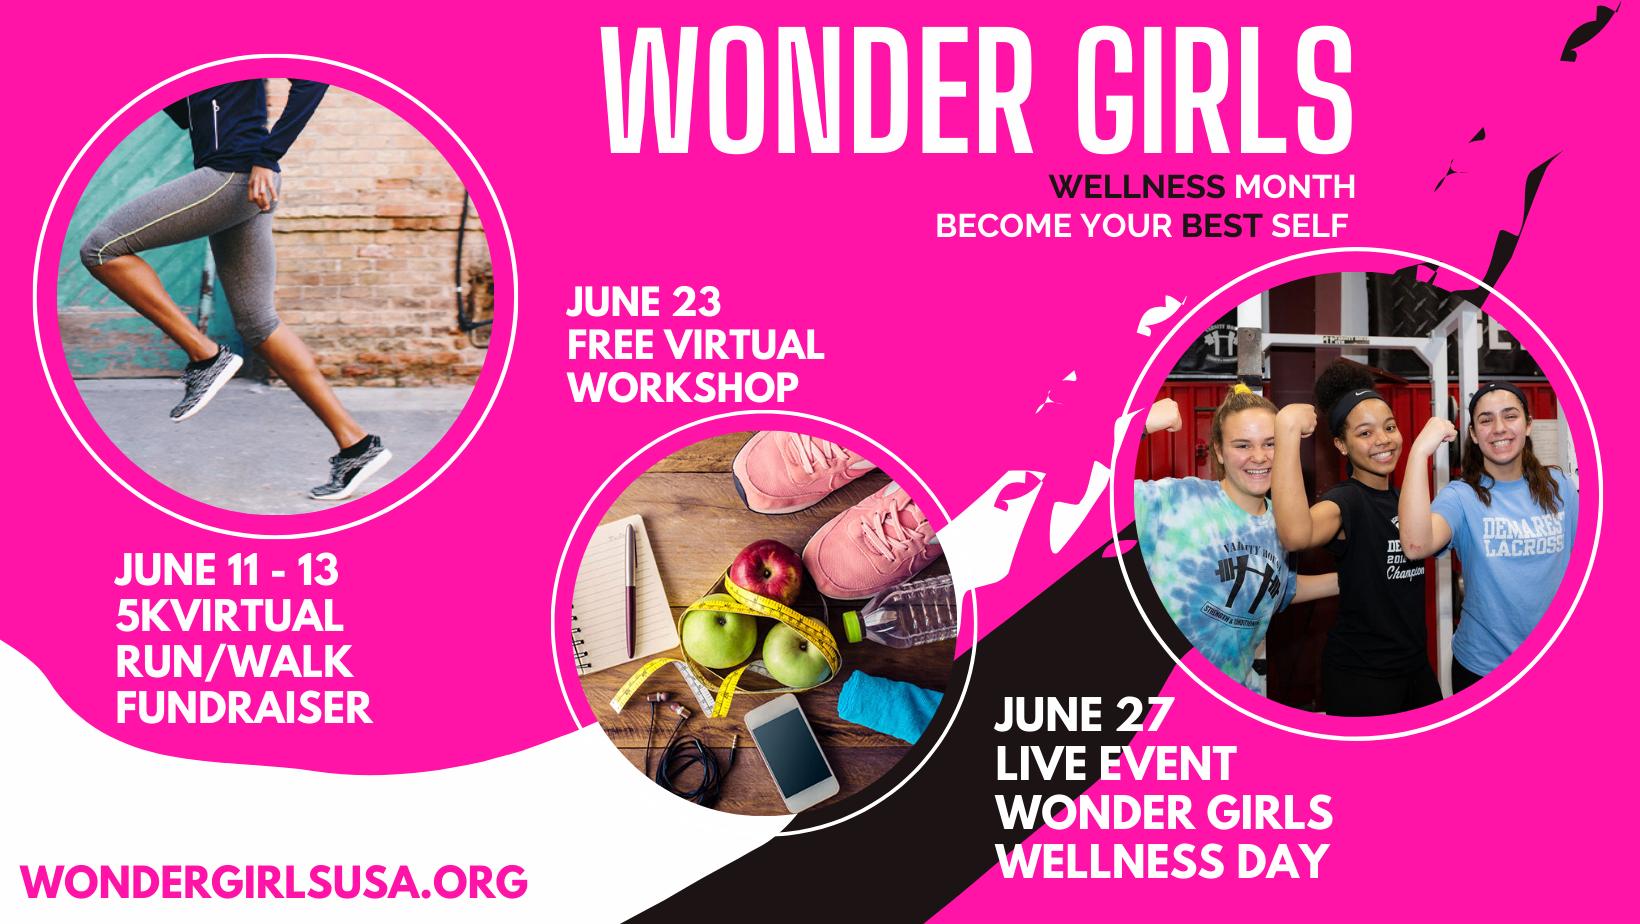 Wonder Girls Virtual 5K Run/Walk Fundraiser at Wonder Girls